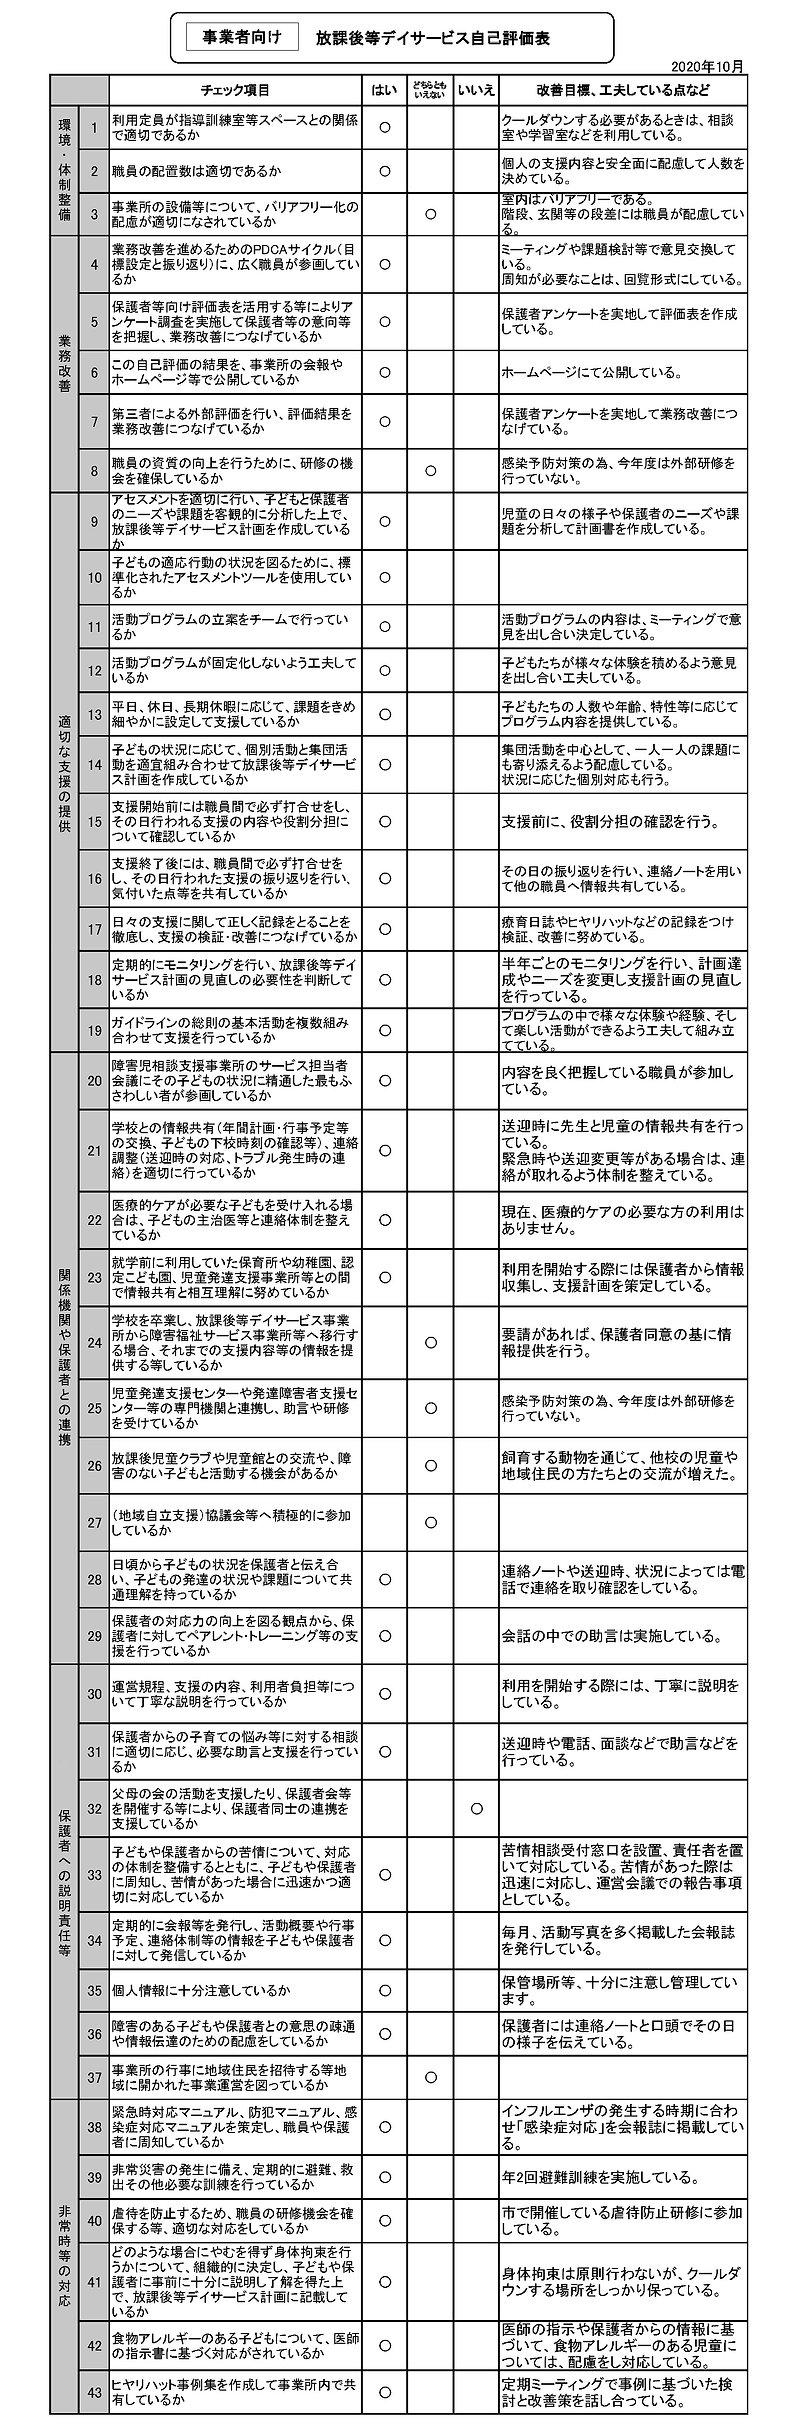 202010事業者向け評価表.jpg